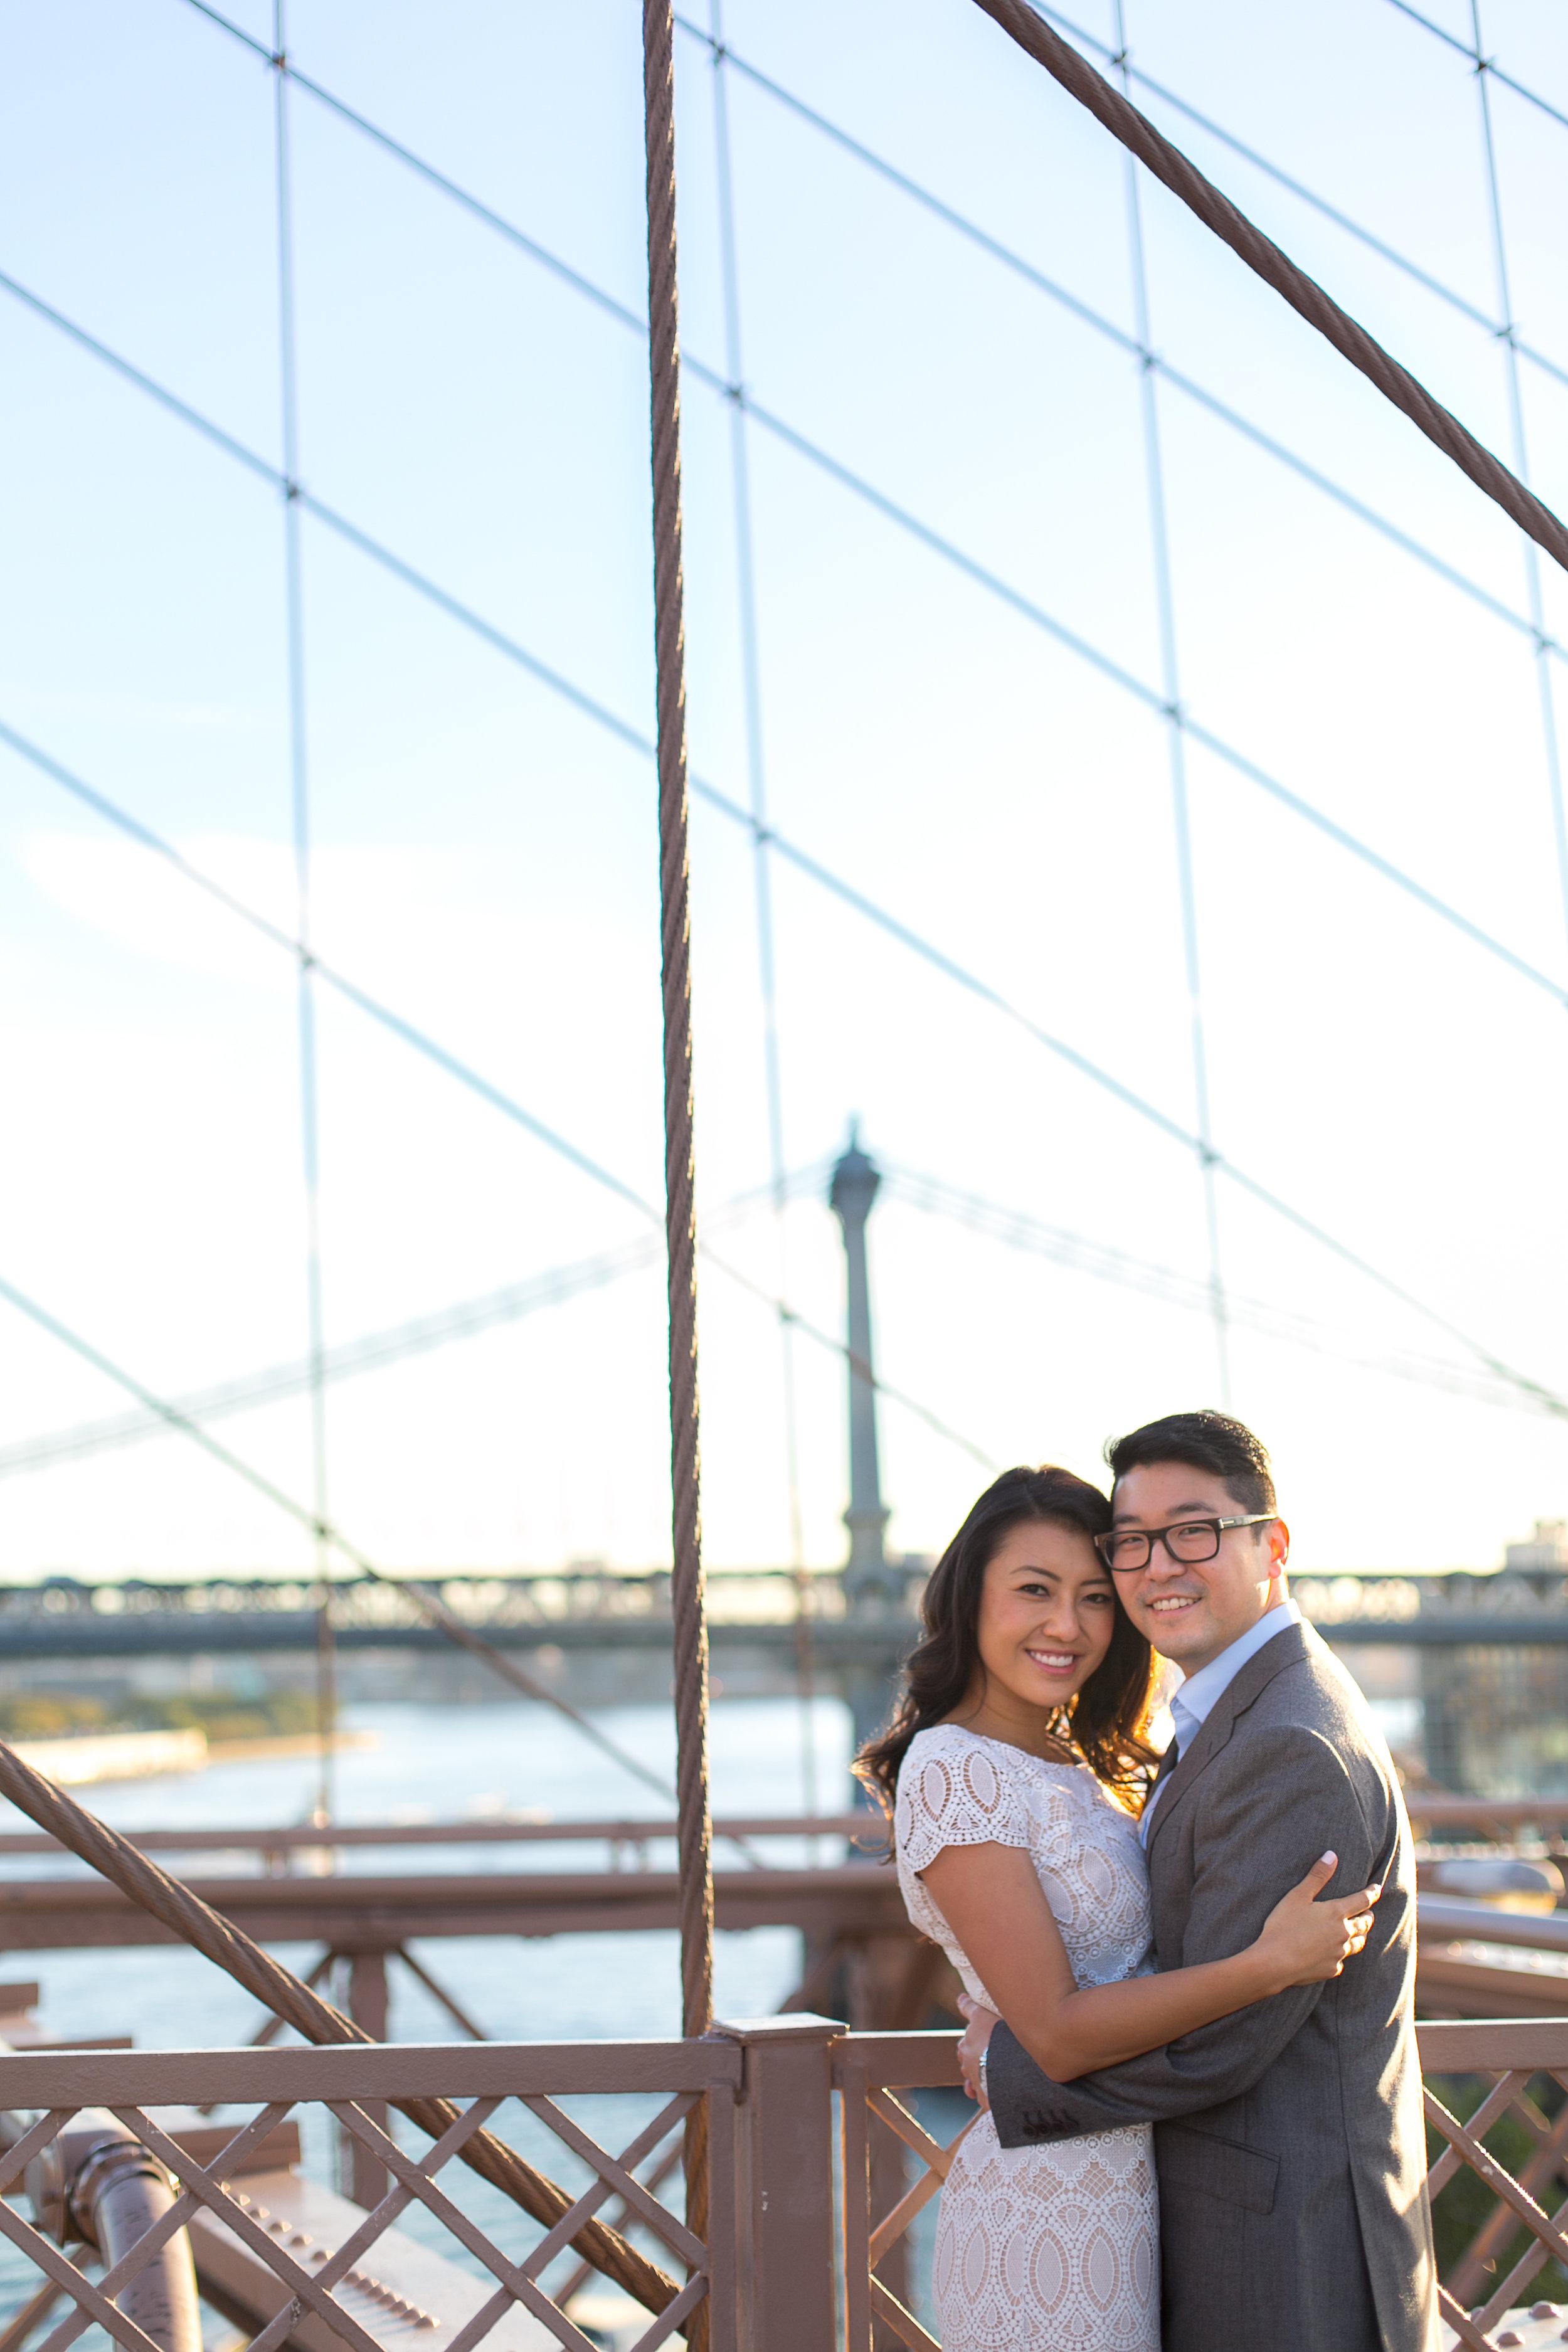 New_York_Engagement_Session_002.jpg